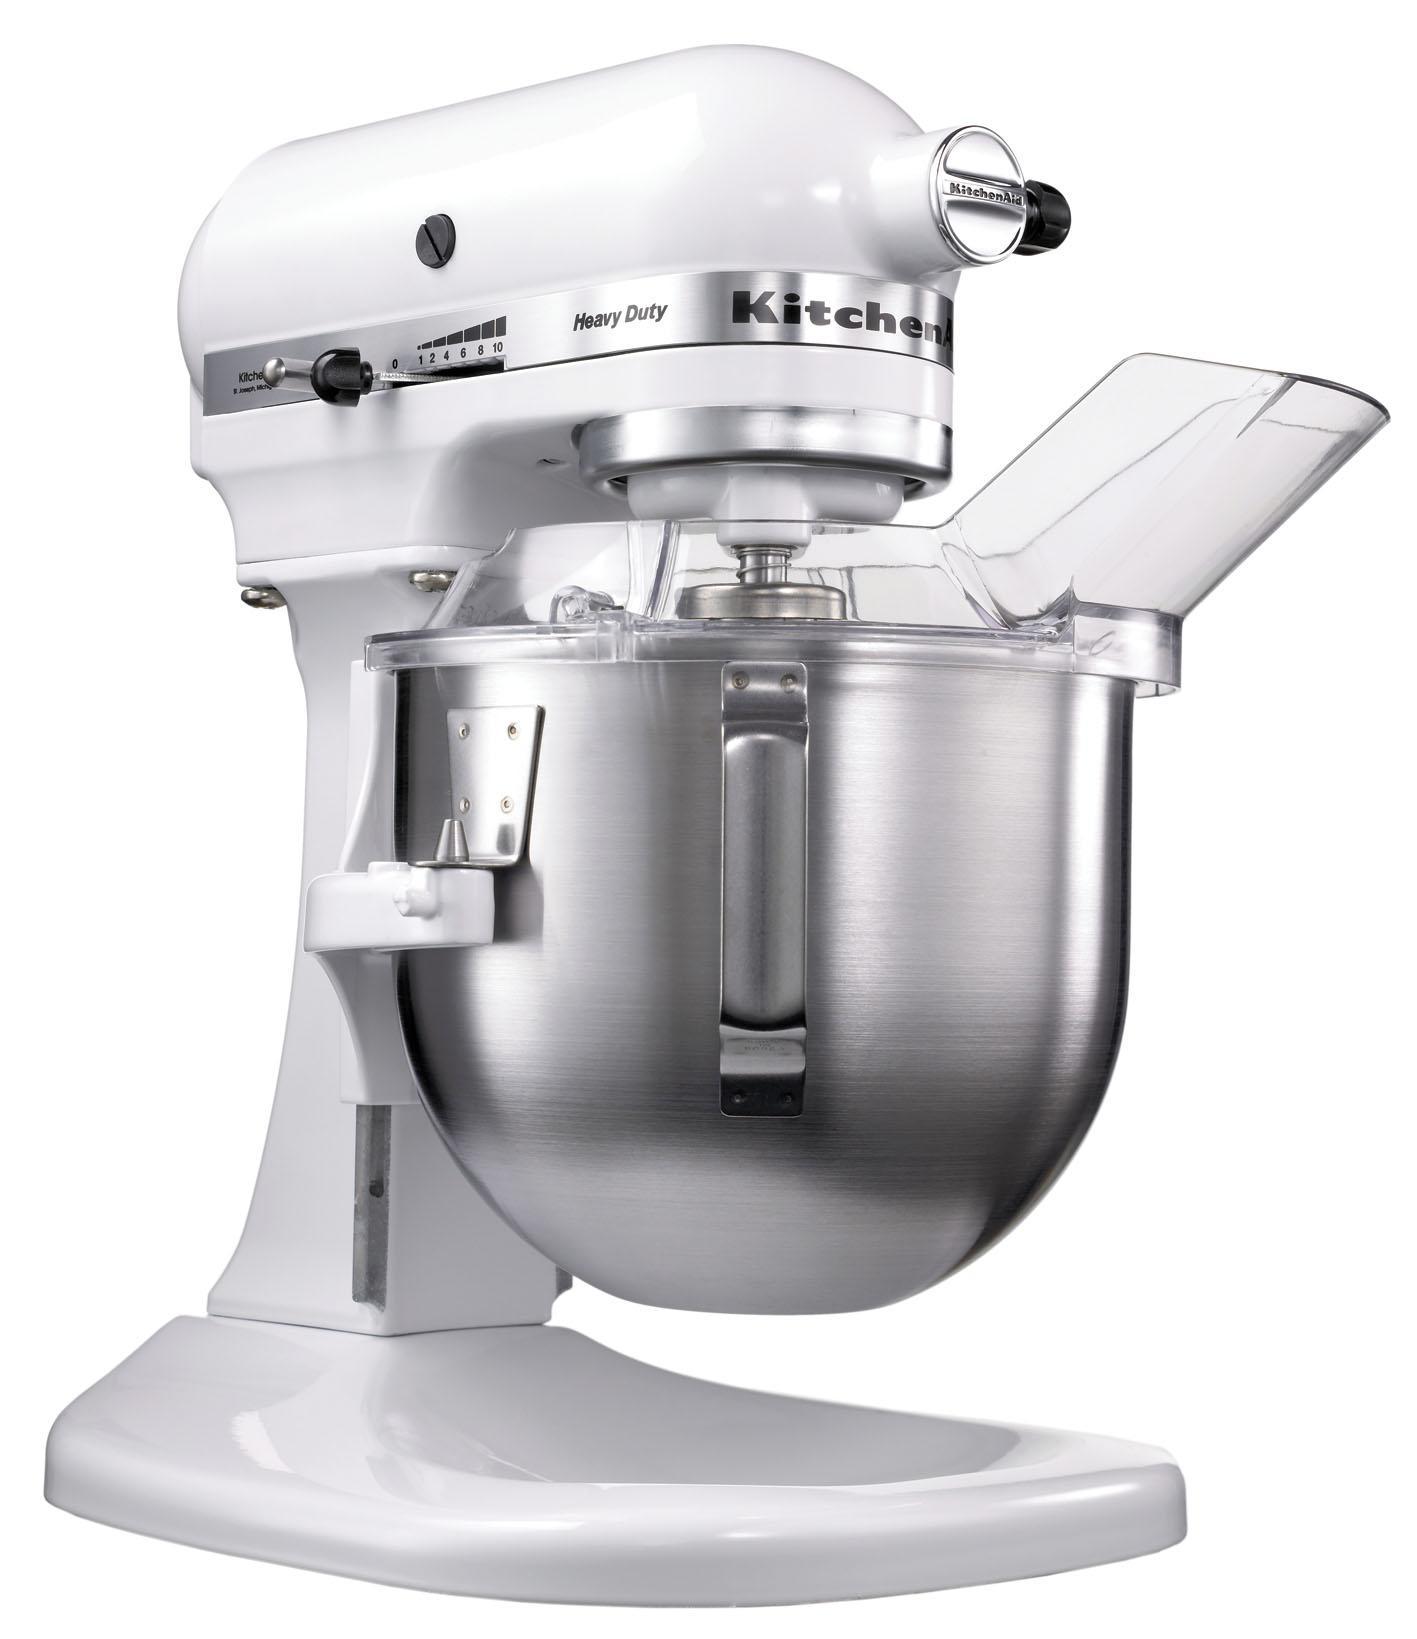 Kitchen aid mixers Photo - 10